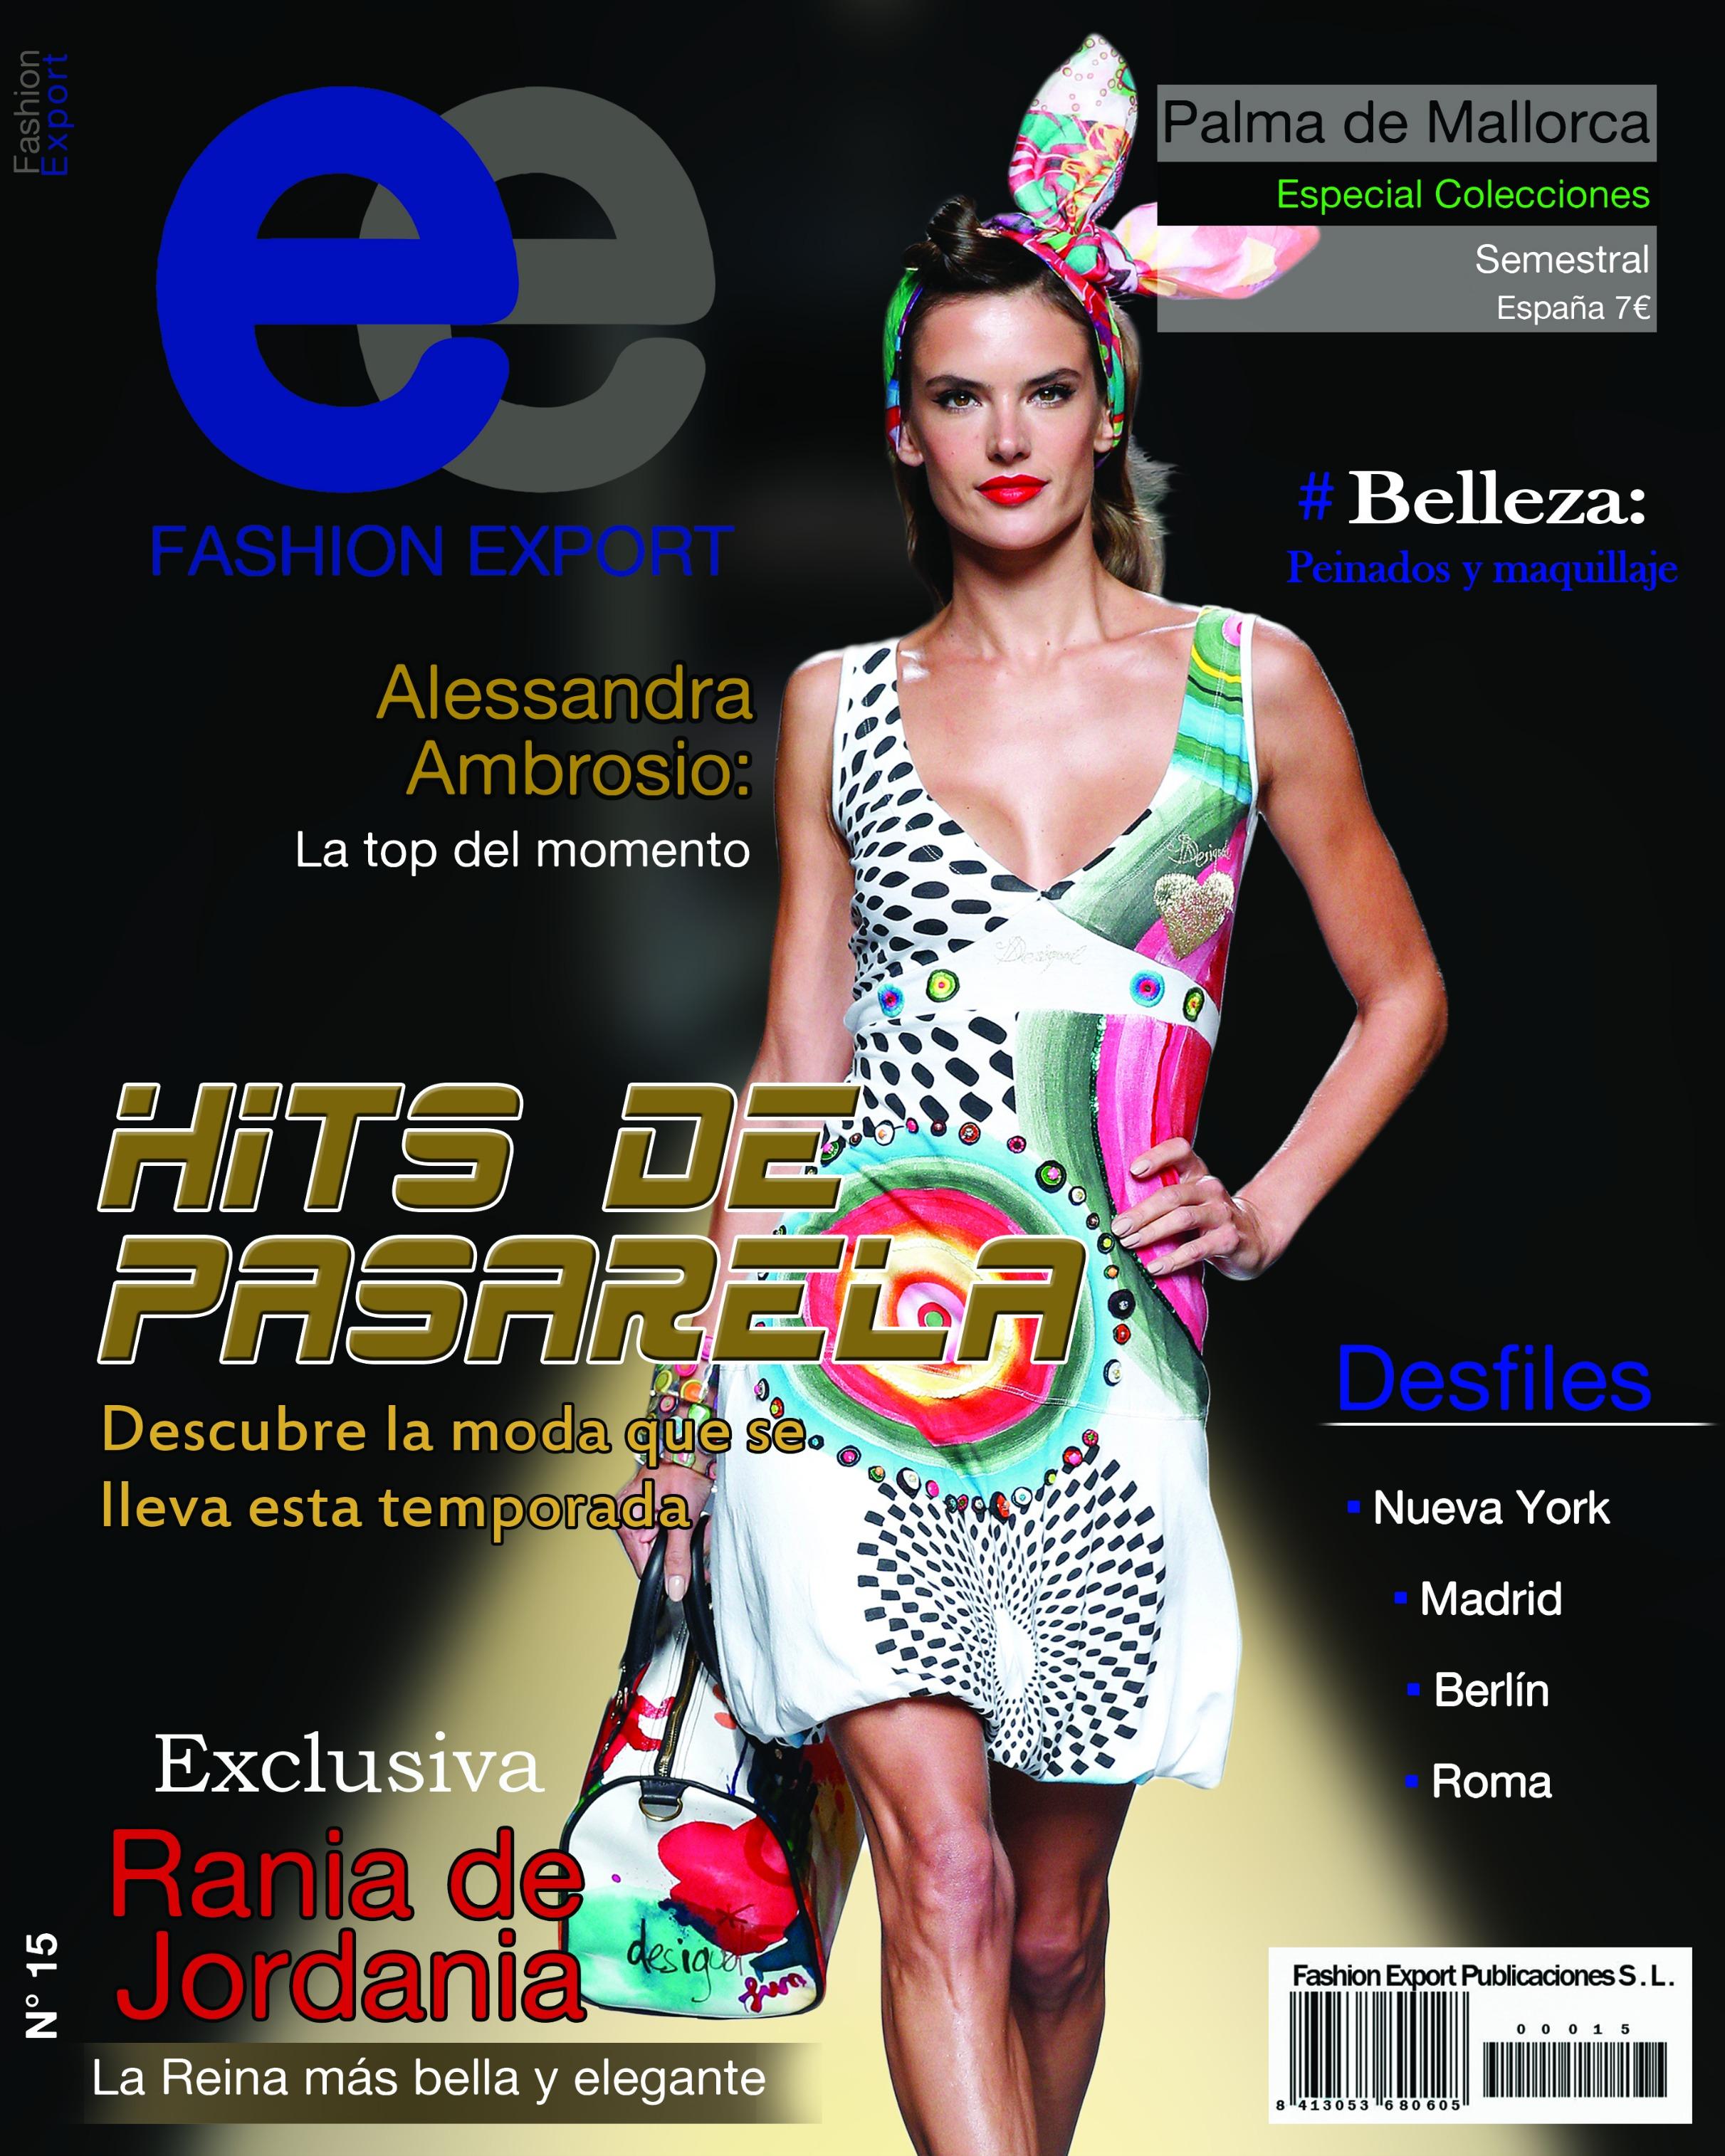 Fashion Export Especial Pasarelas